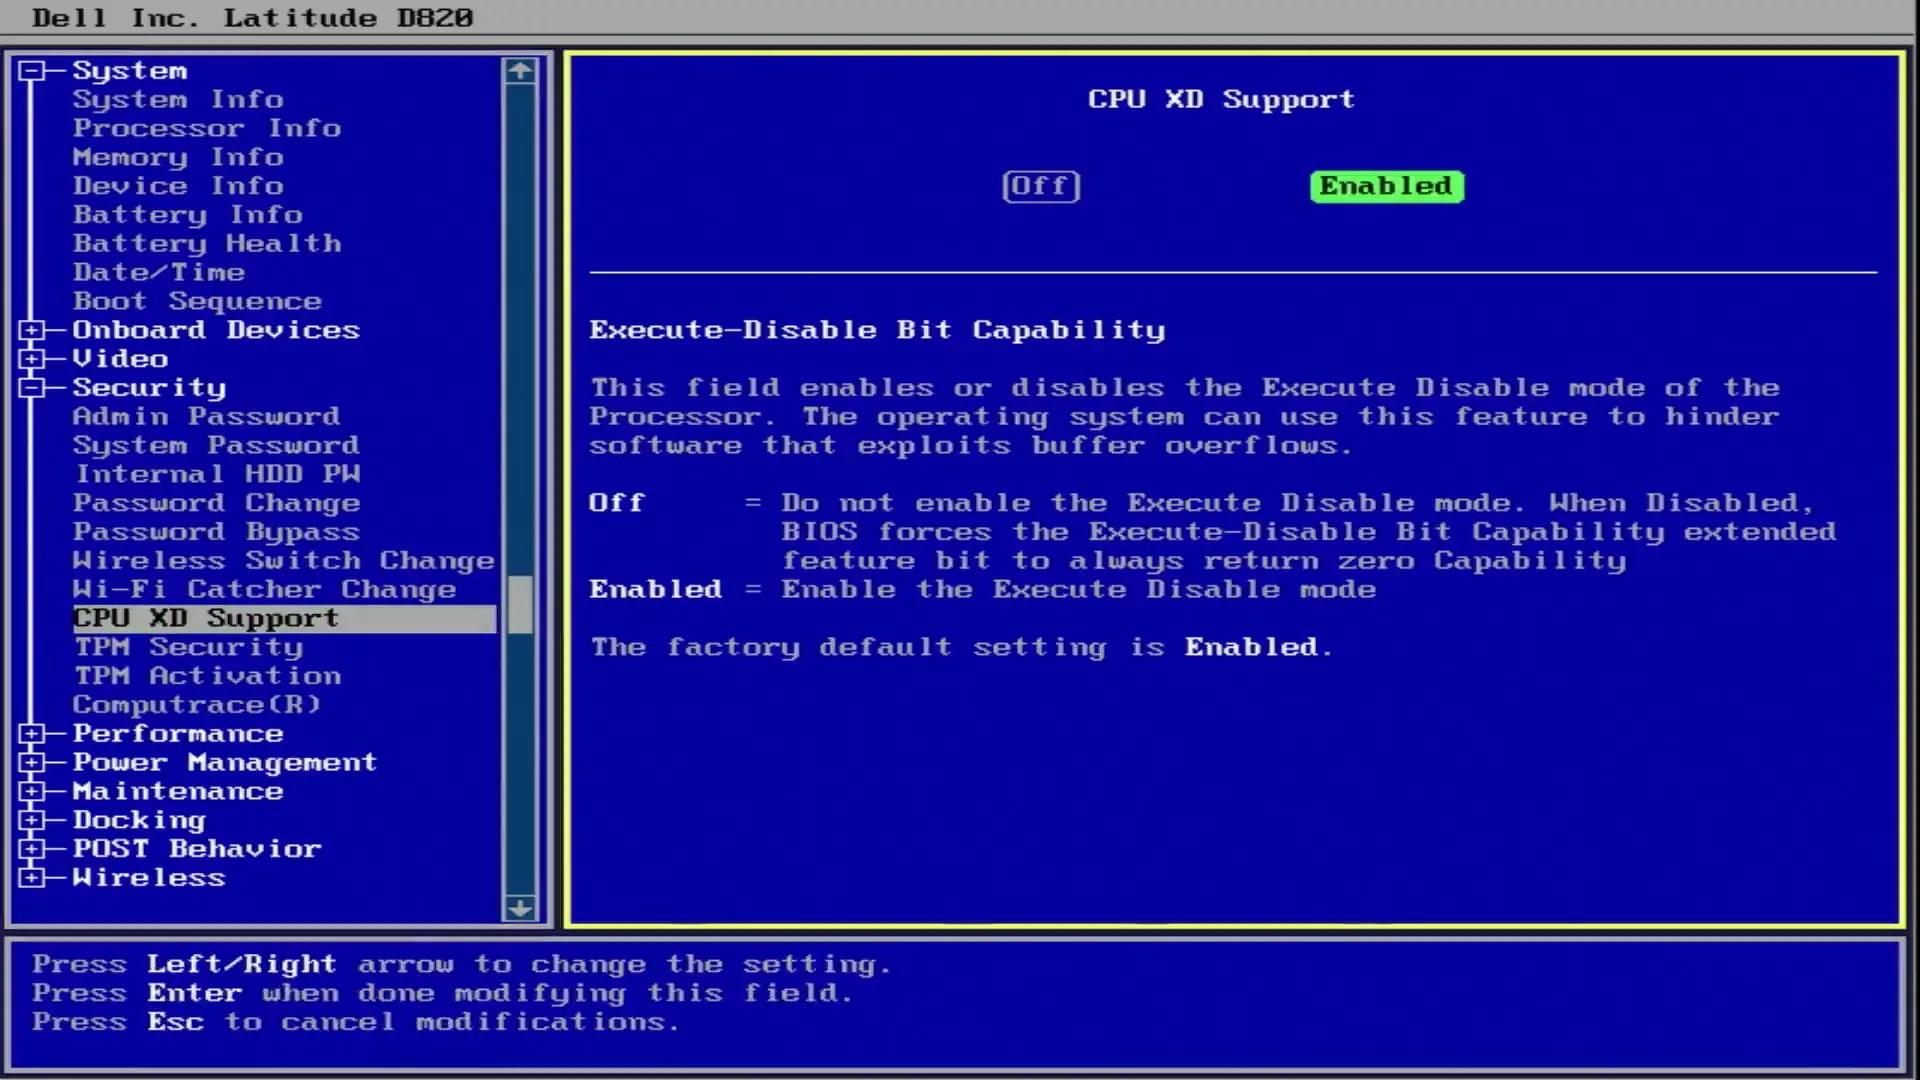 Memory Ram 4 Acer Aspire Desktop M1610 M1620 M1640 M1641 M1641-218Y 2x Lot